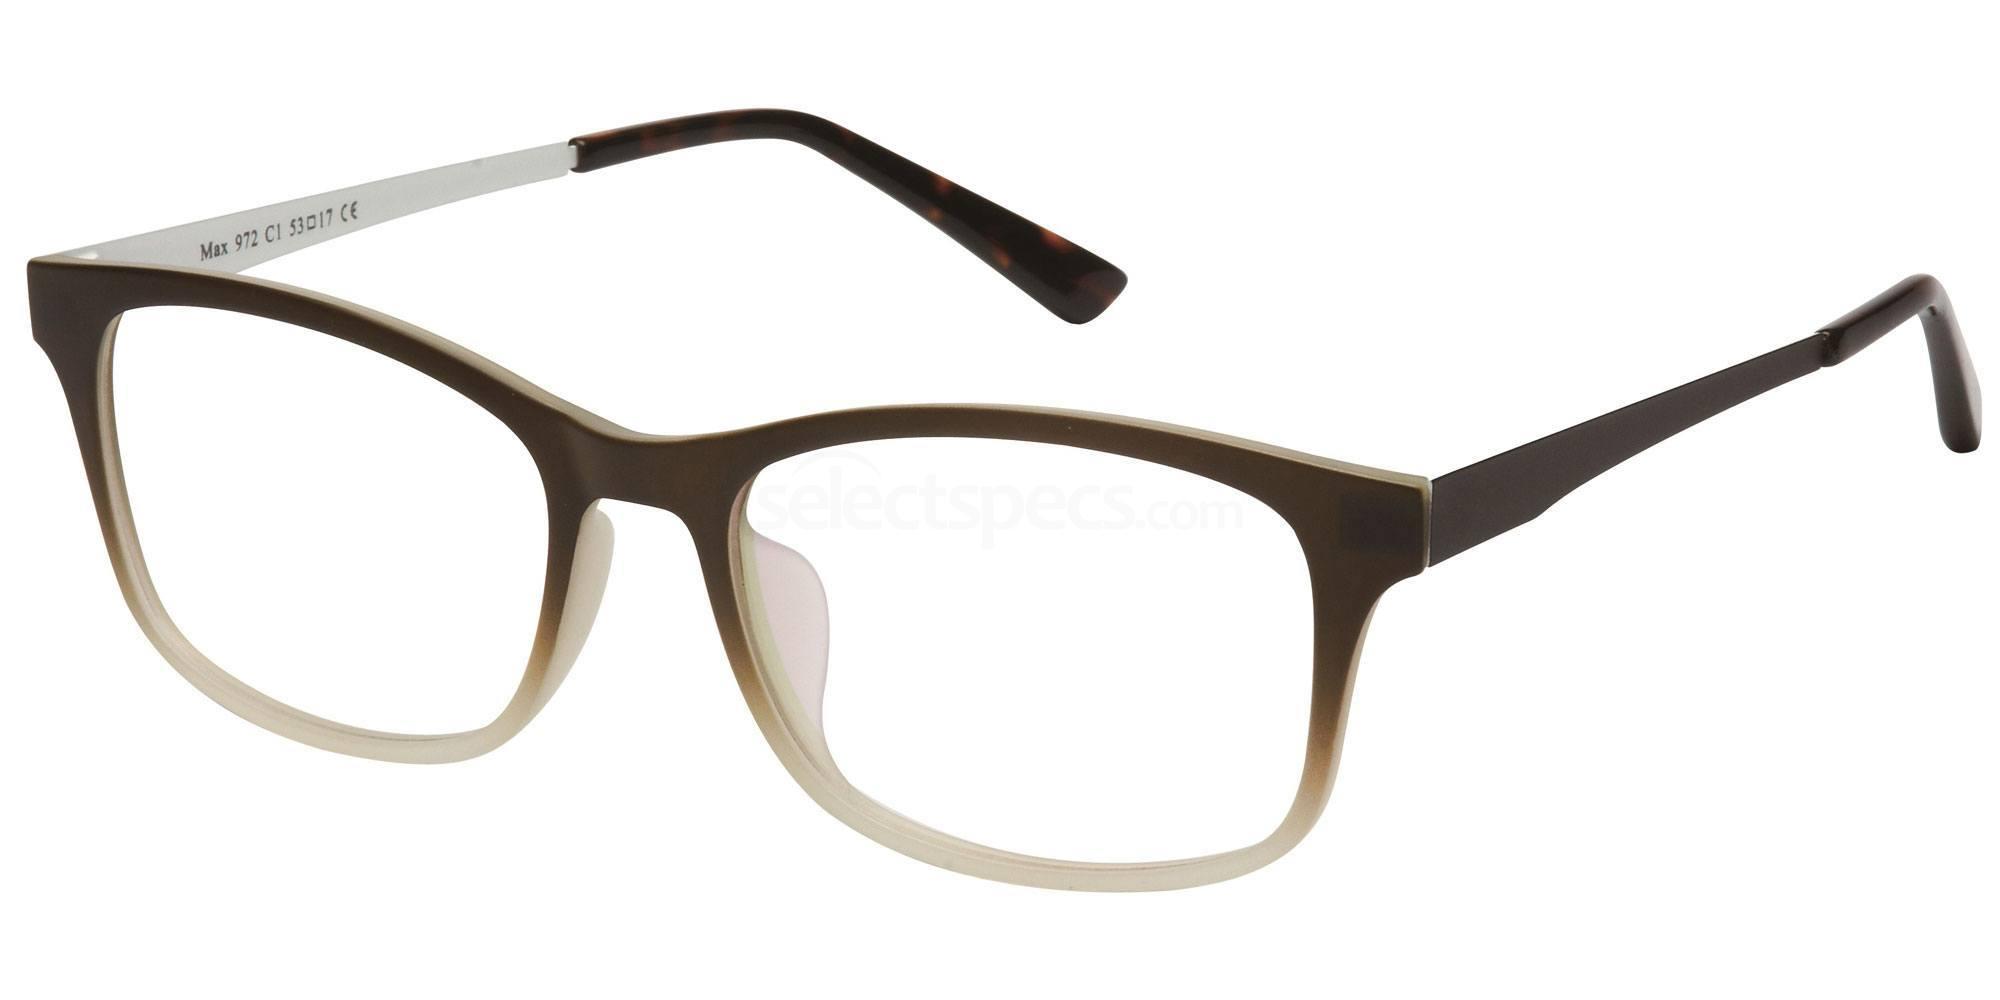 C1 M972 Glasses, Max Eyewear